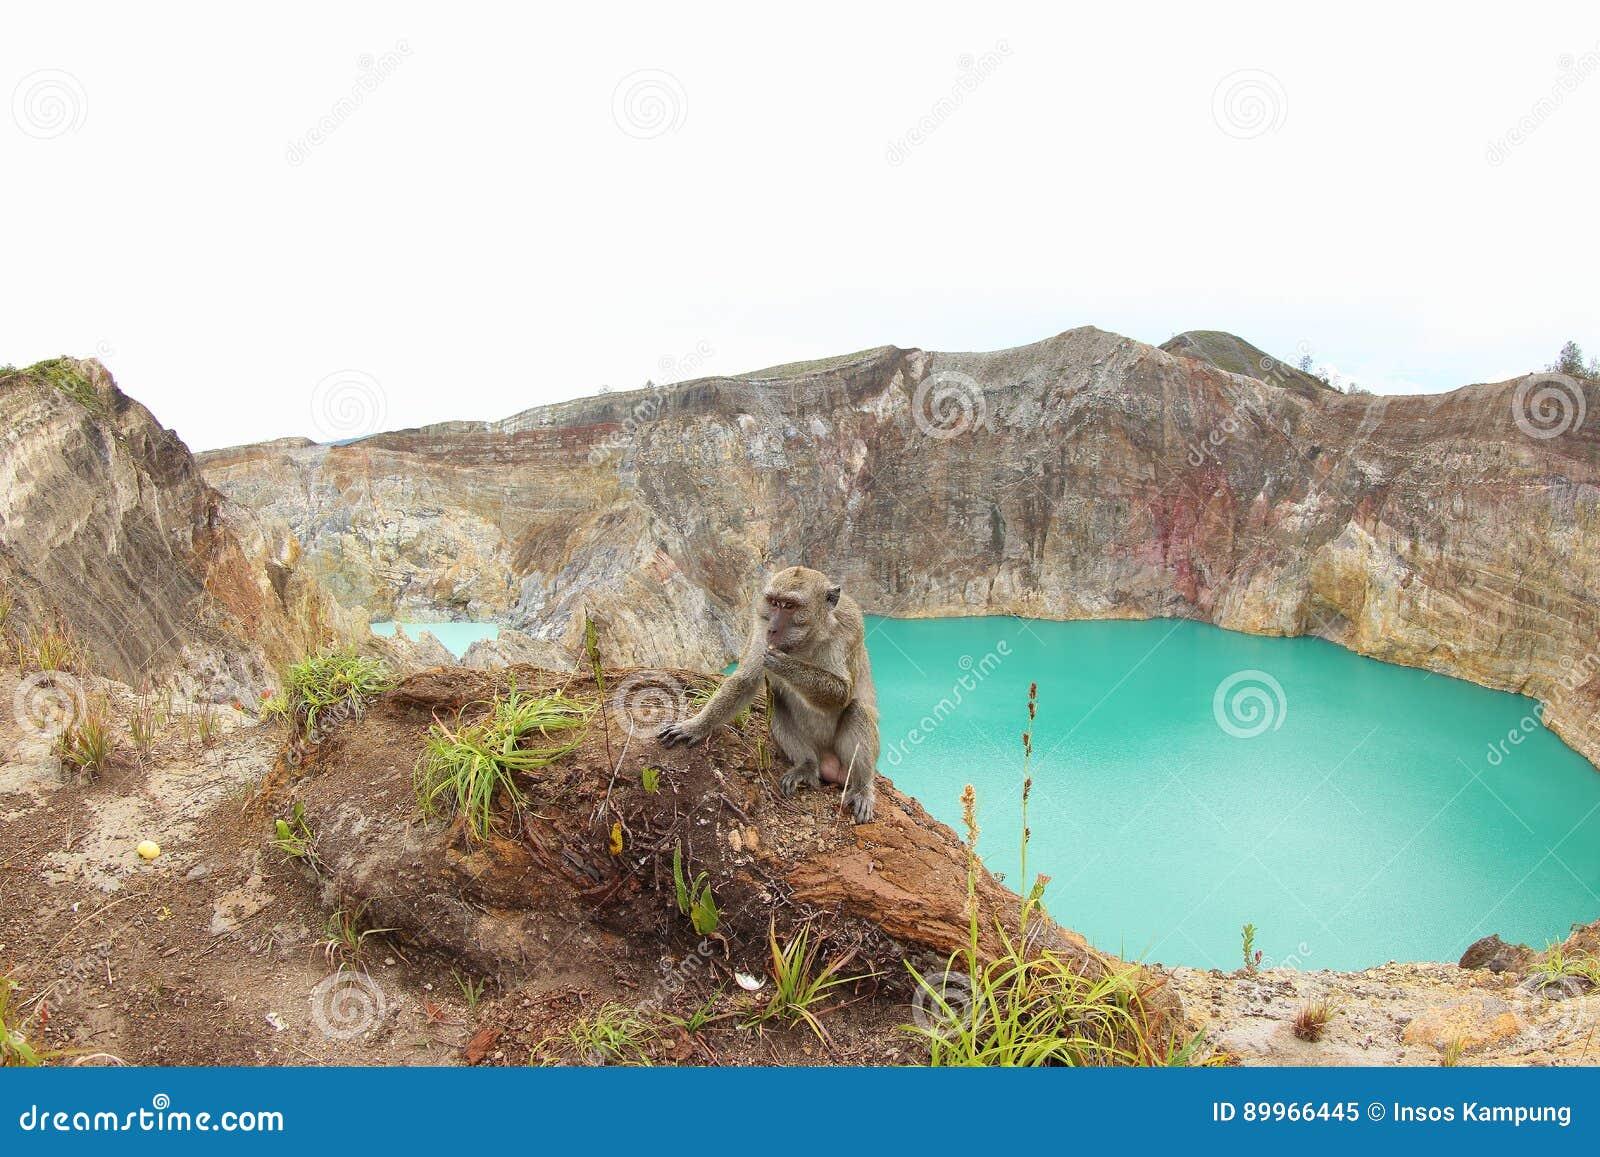 Monkey at Kelimutu Crater Lakes